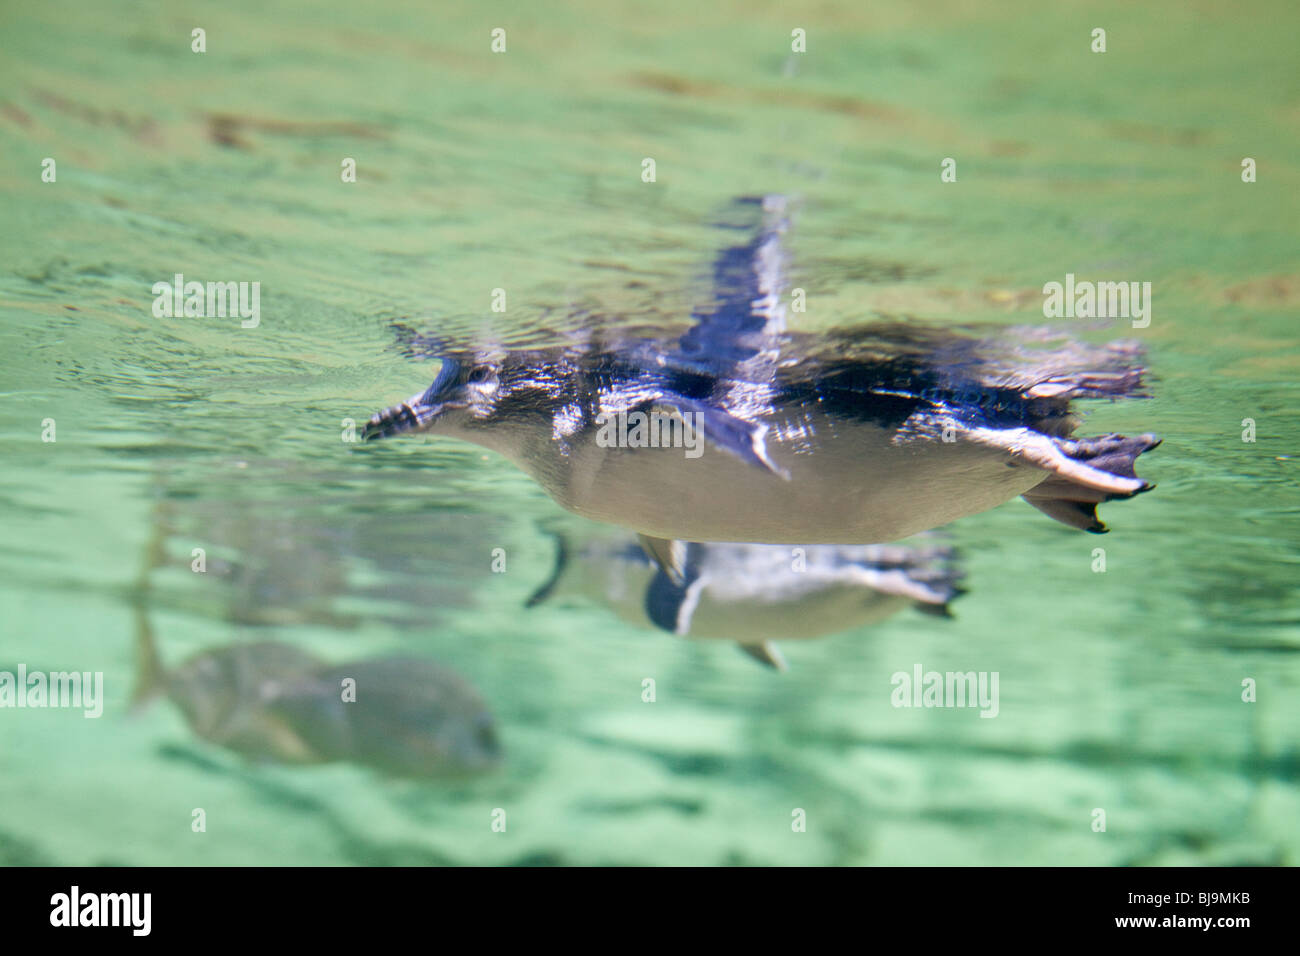 Swimming Penguins seen from underwater, Sydney, Australia - Stock Image